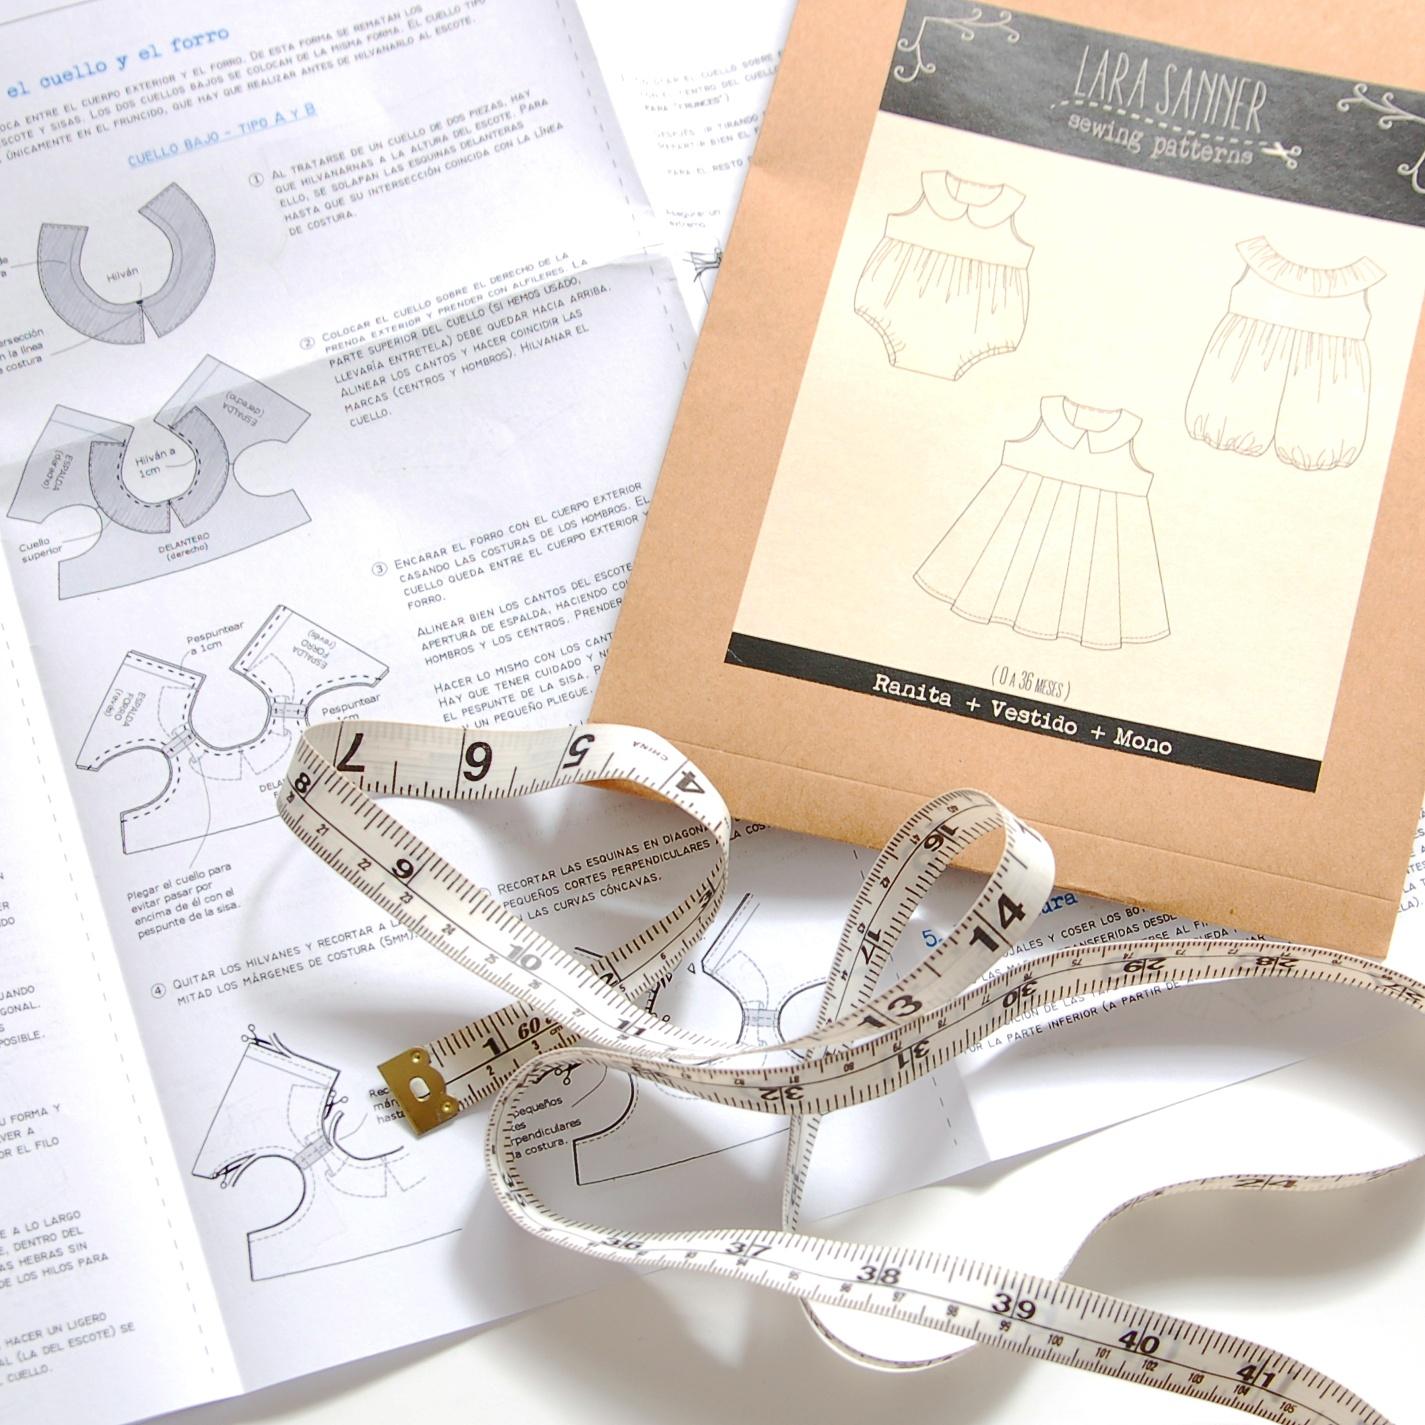 Lara Sanner Sewing Patterns — Studio COSTURA